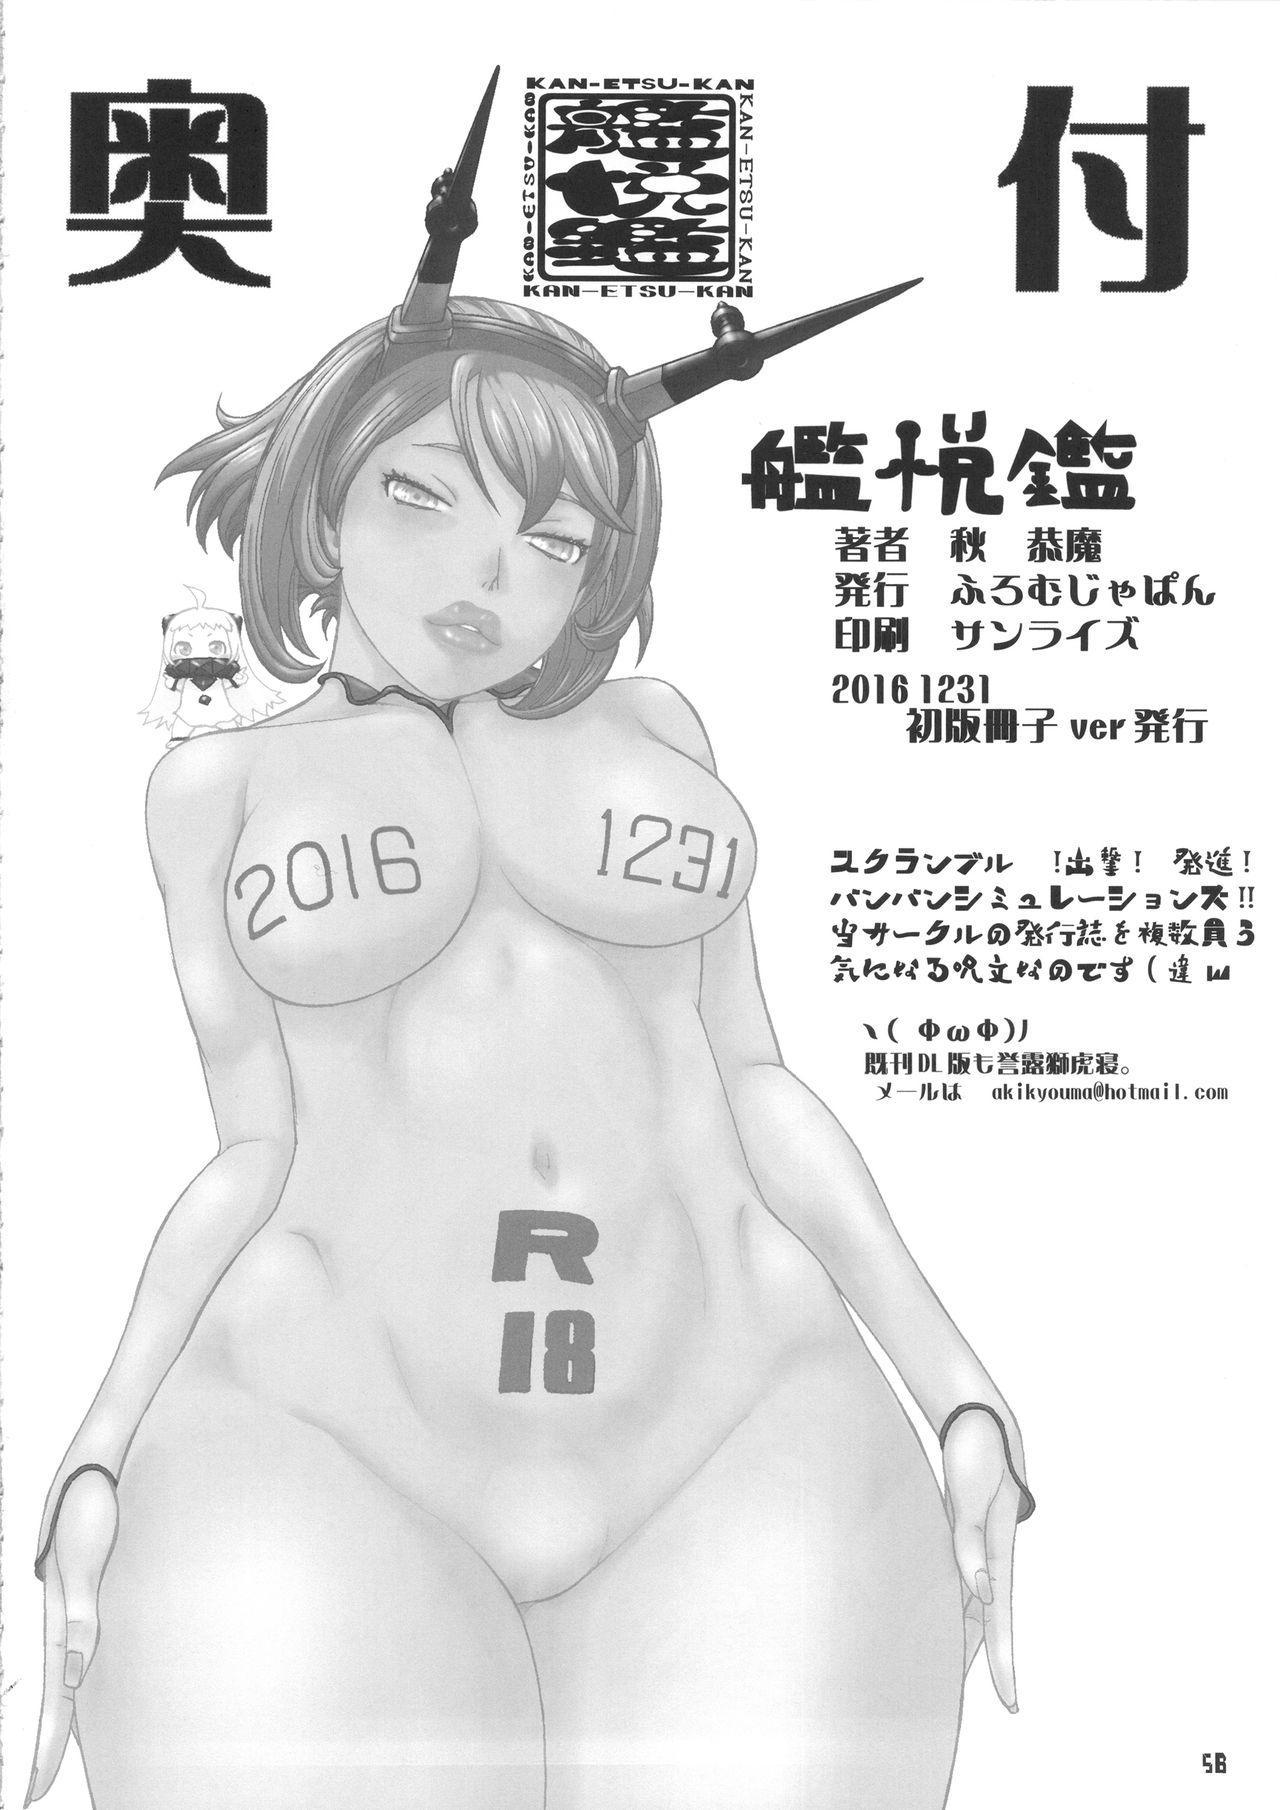 (C91) [From Japan (Aki Kyouma)] KAN-ETSU-KAN (Kantai Collection -KanColle-) 54